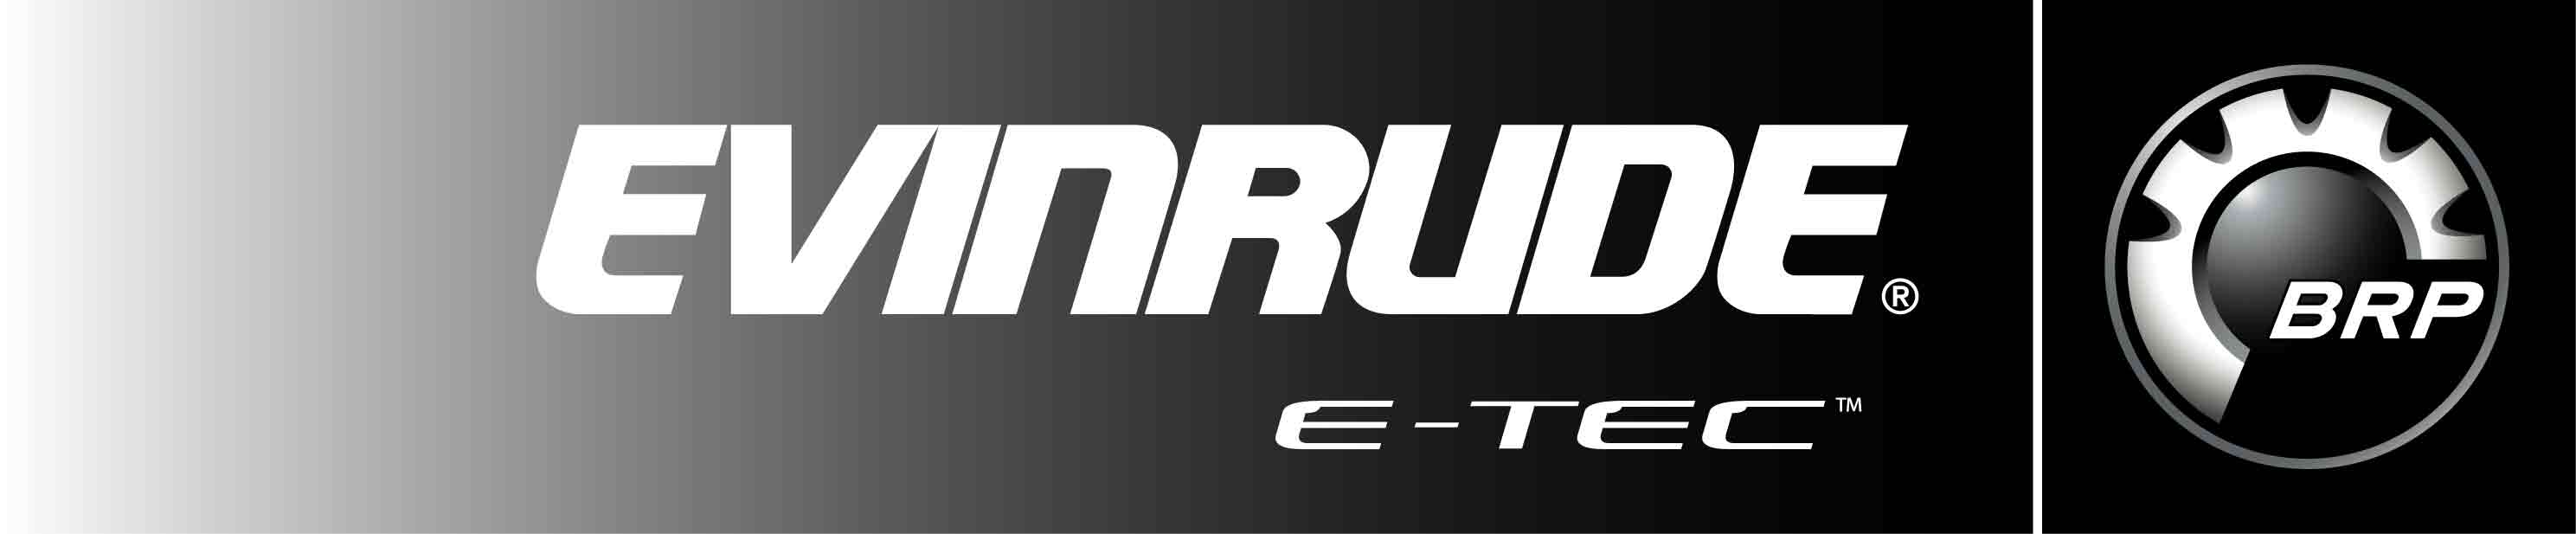 Evinrude Logo Www Imgkid Com The Image Kid Has It